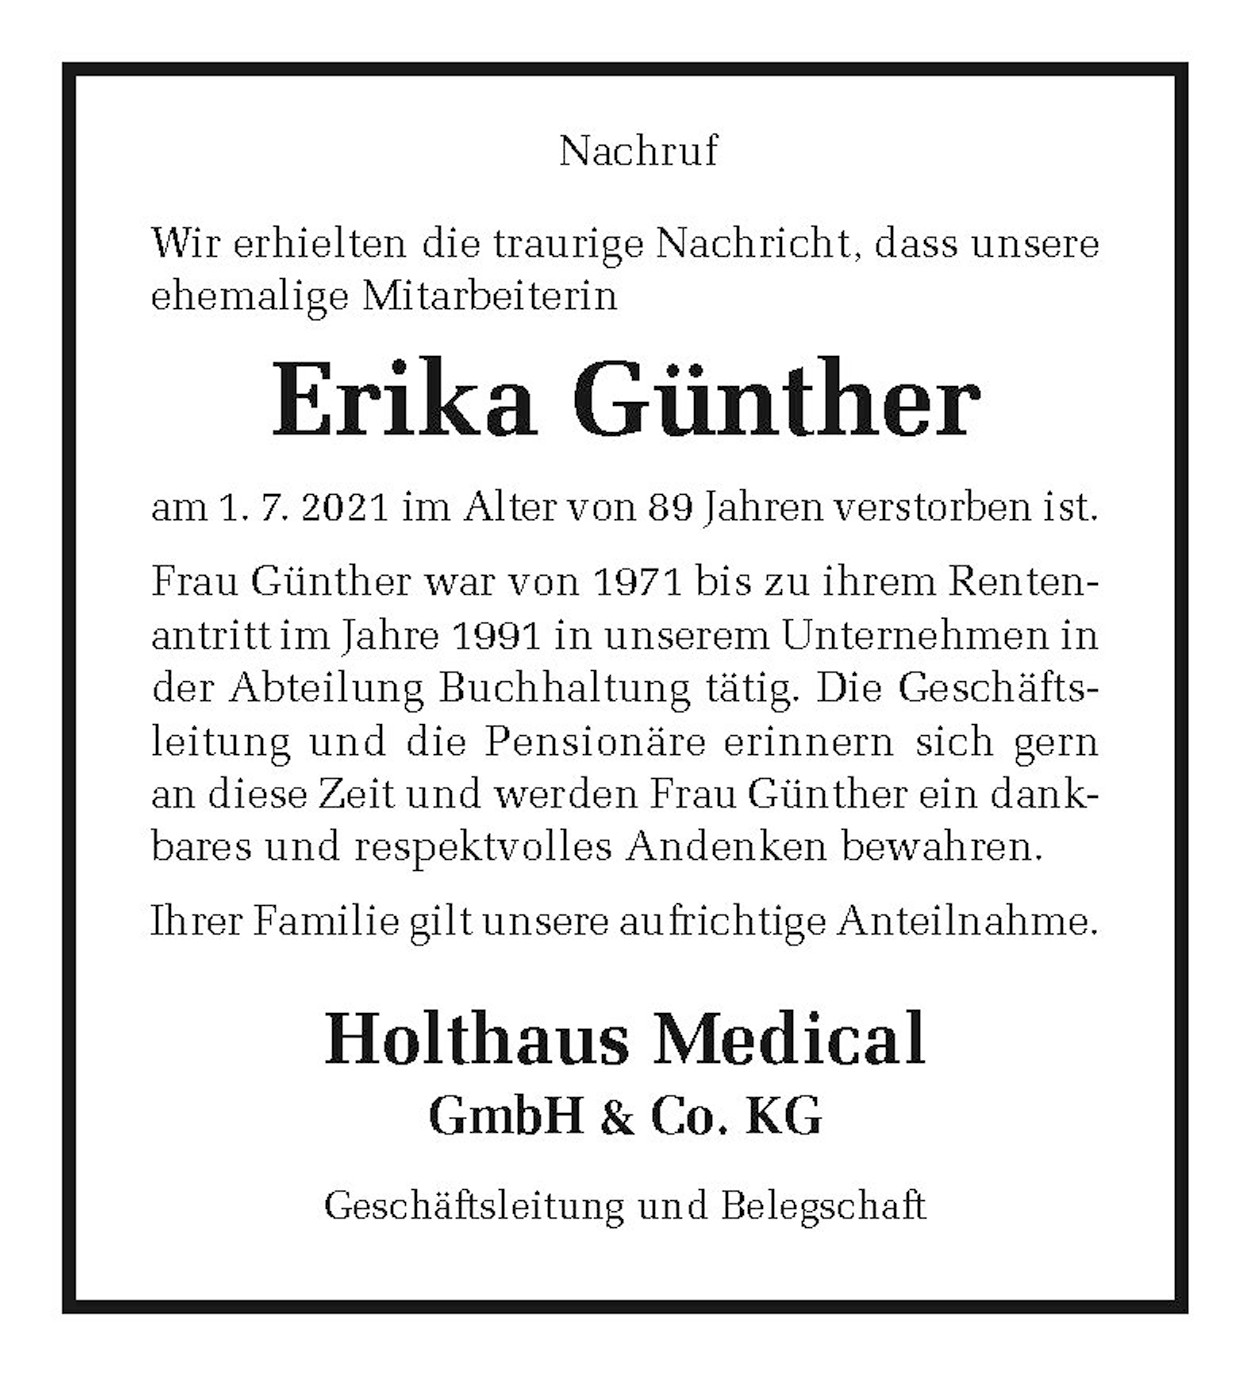 Nachruf Erika Günther ,der Holthaus Medical GmbH